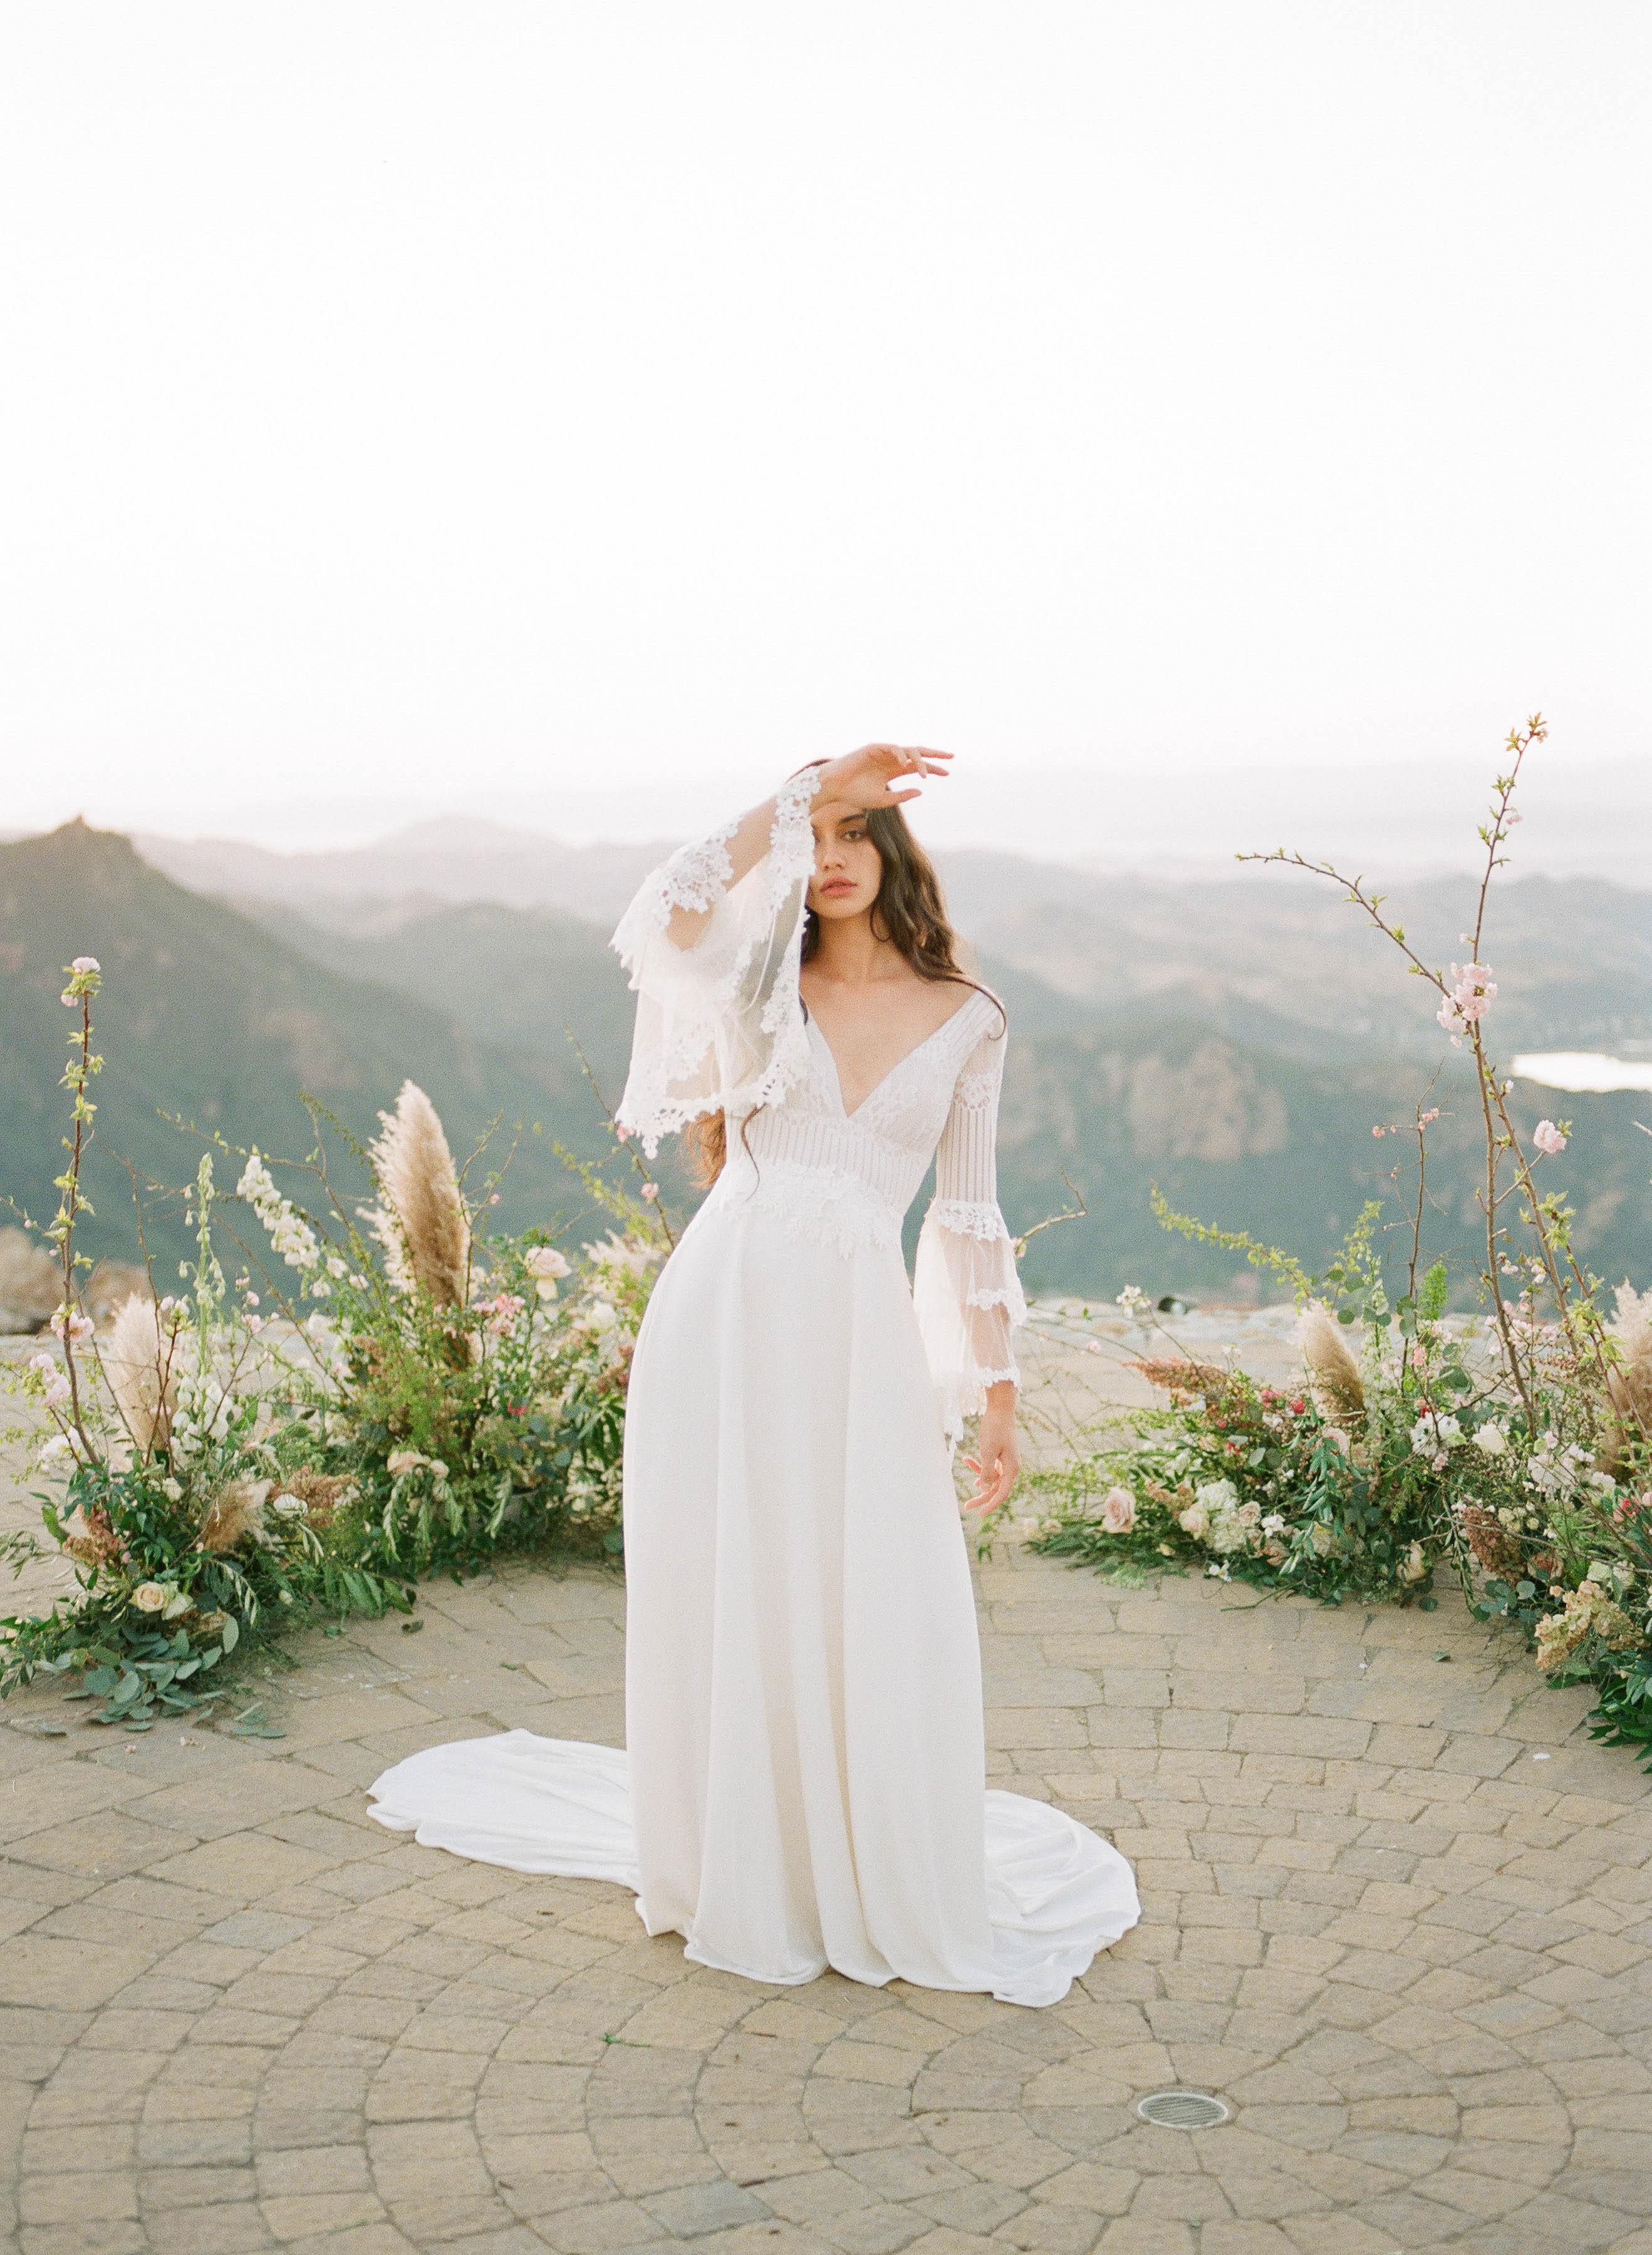 wedding dress bridal boutique shop salon raleigh nc north carolina ...